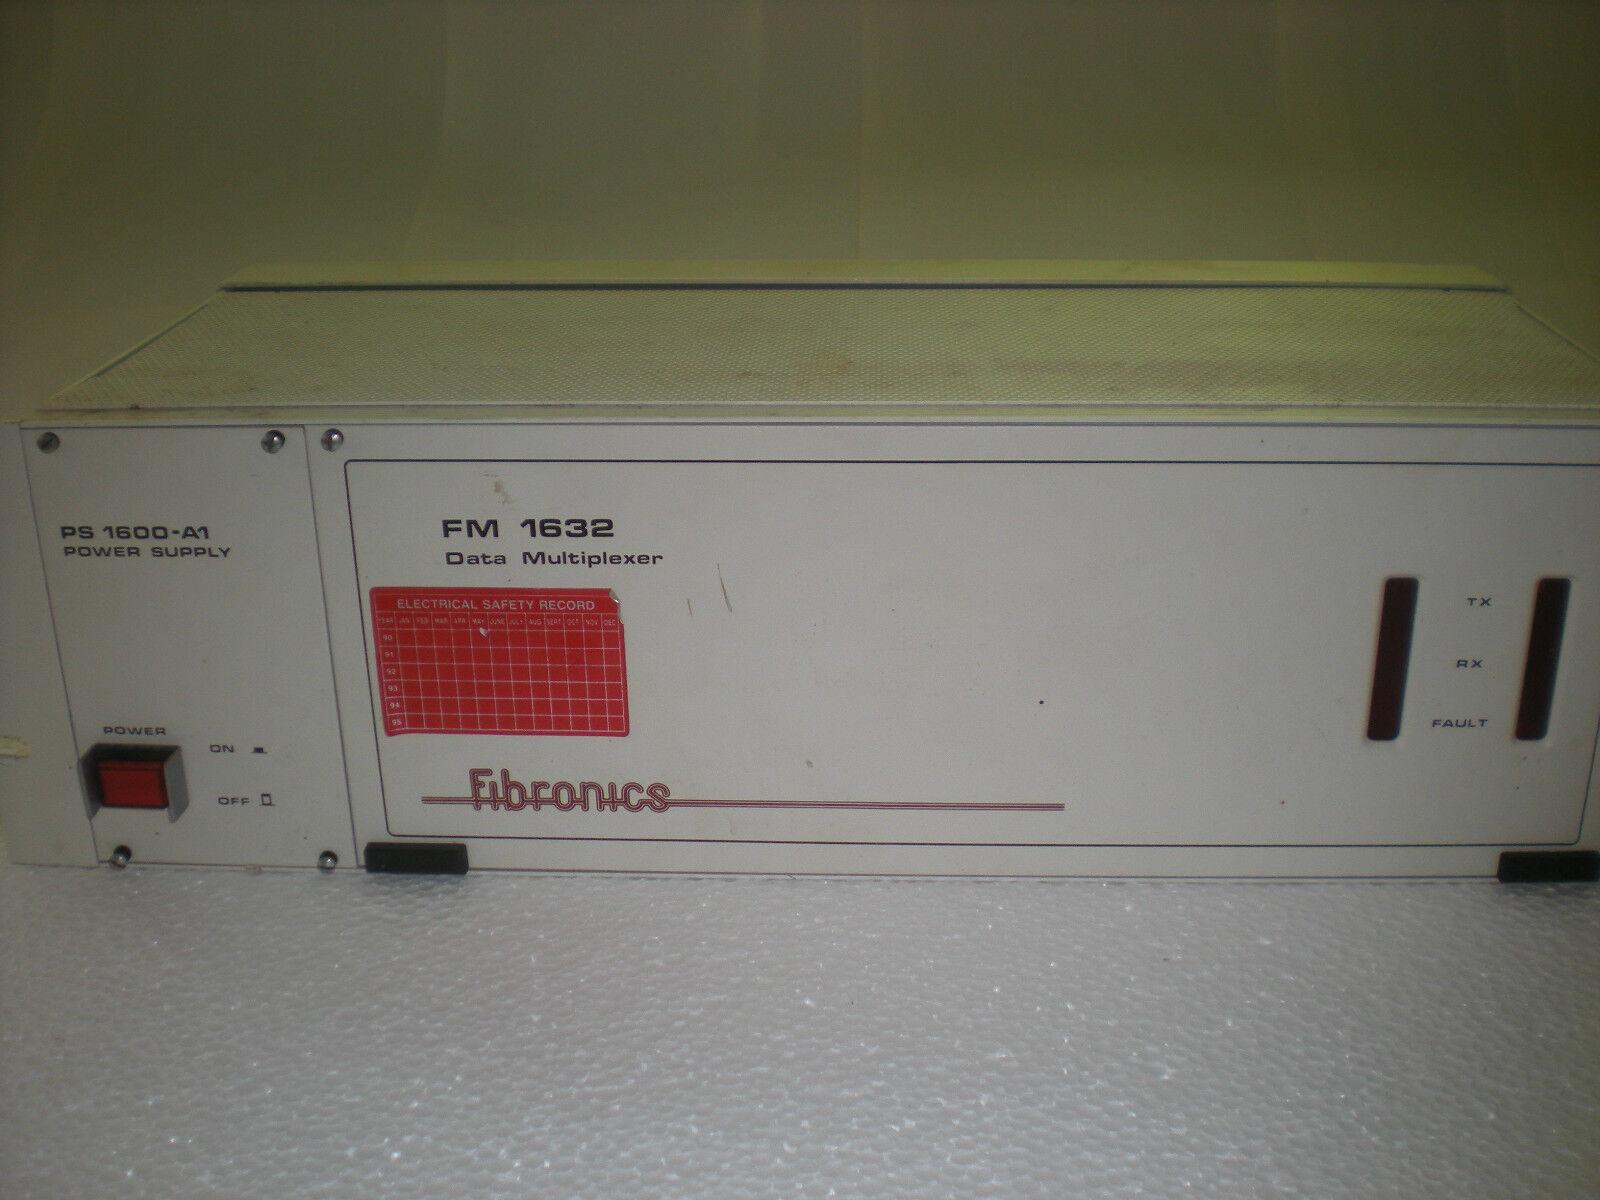 Fiber Optic Fibronics FM1632 16-port Data Multiplexer, Data Communication